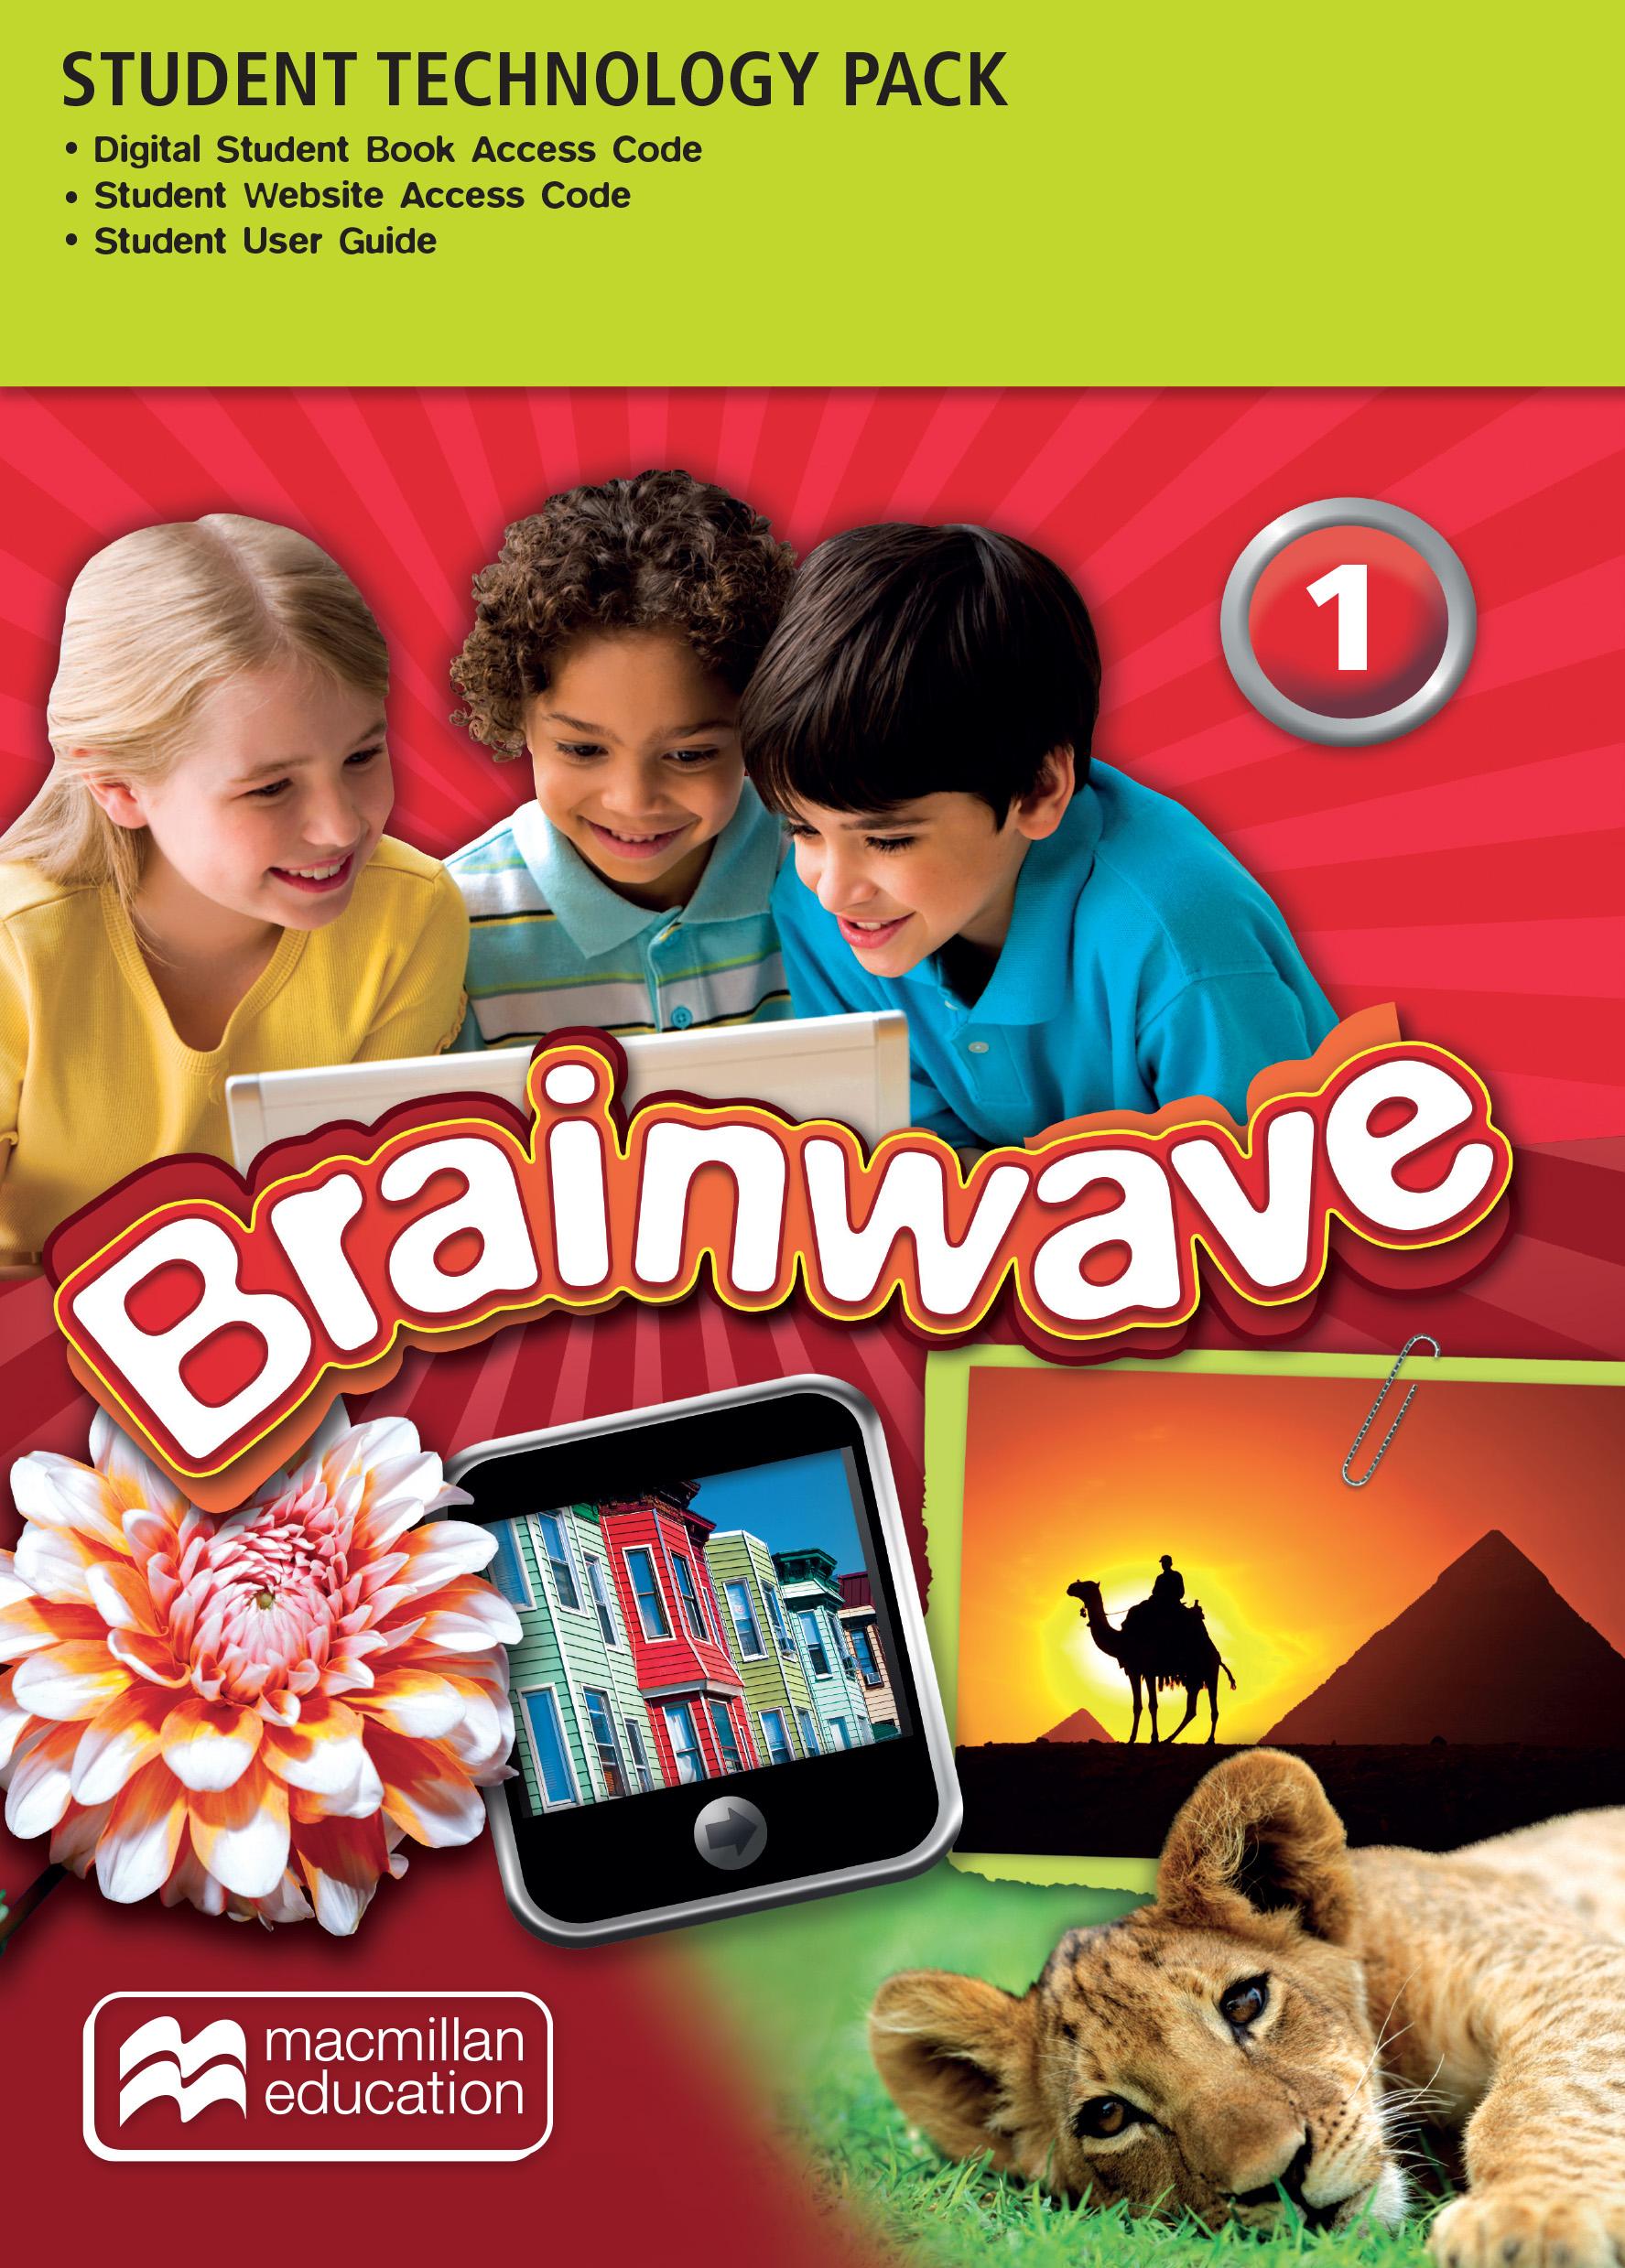 Brainwave 1 Student Technology Pack